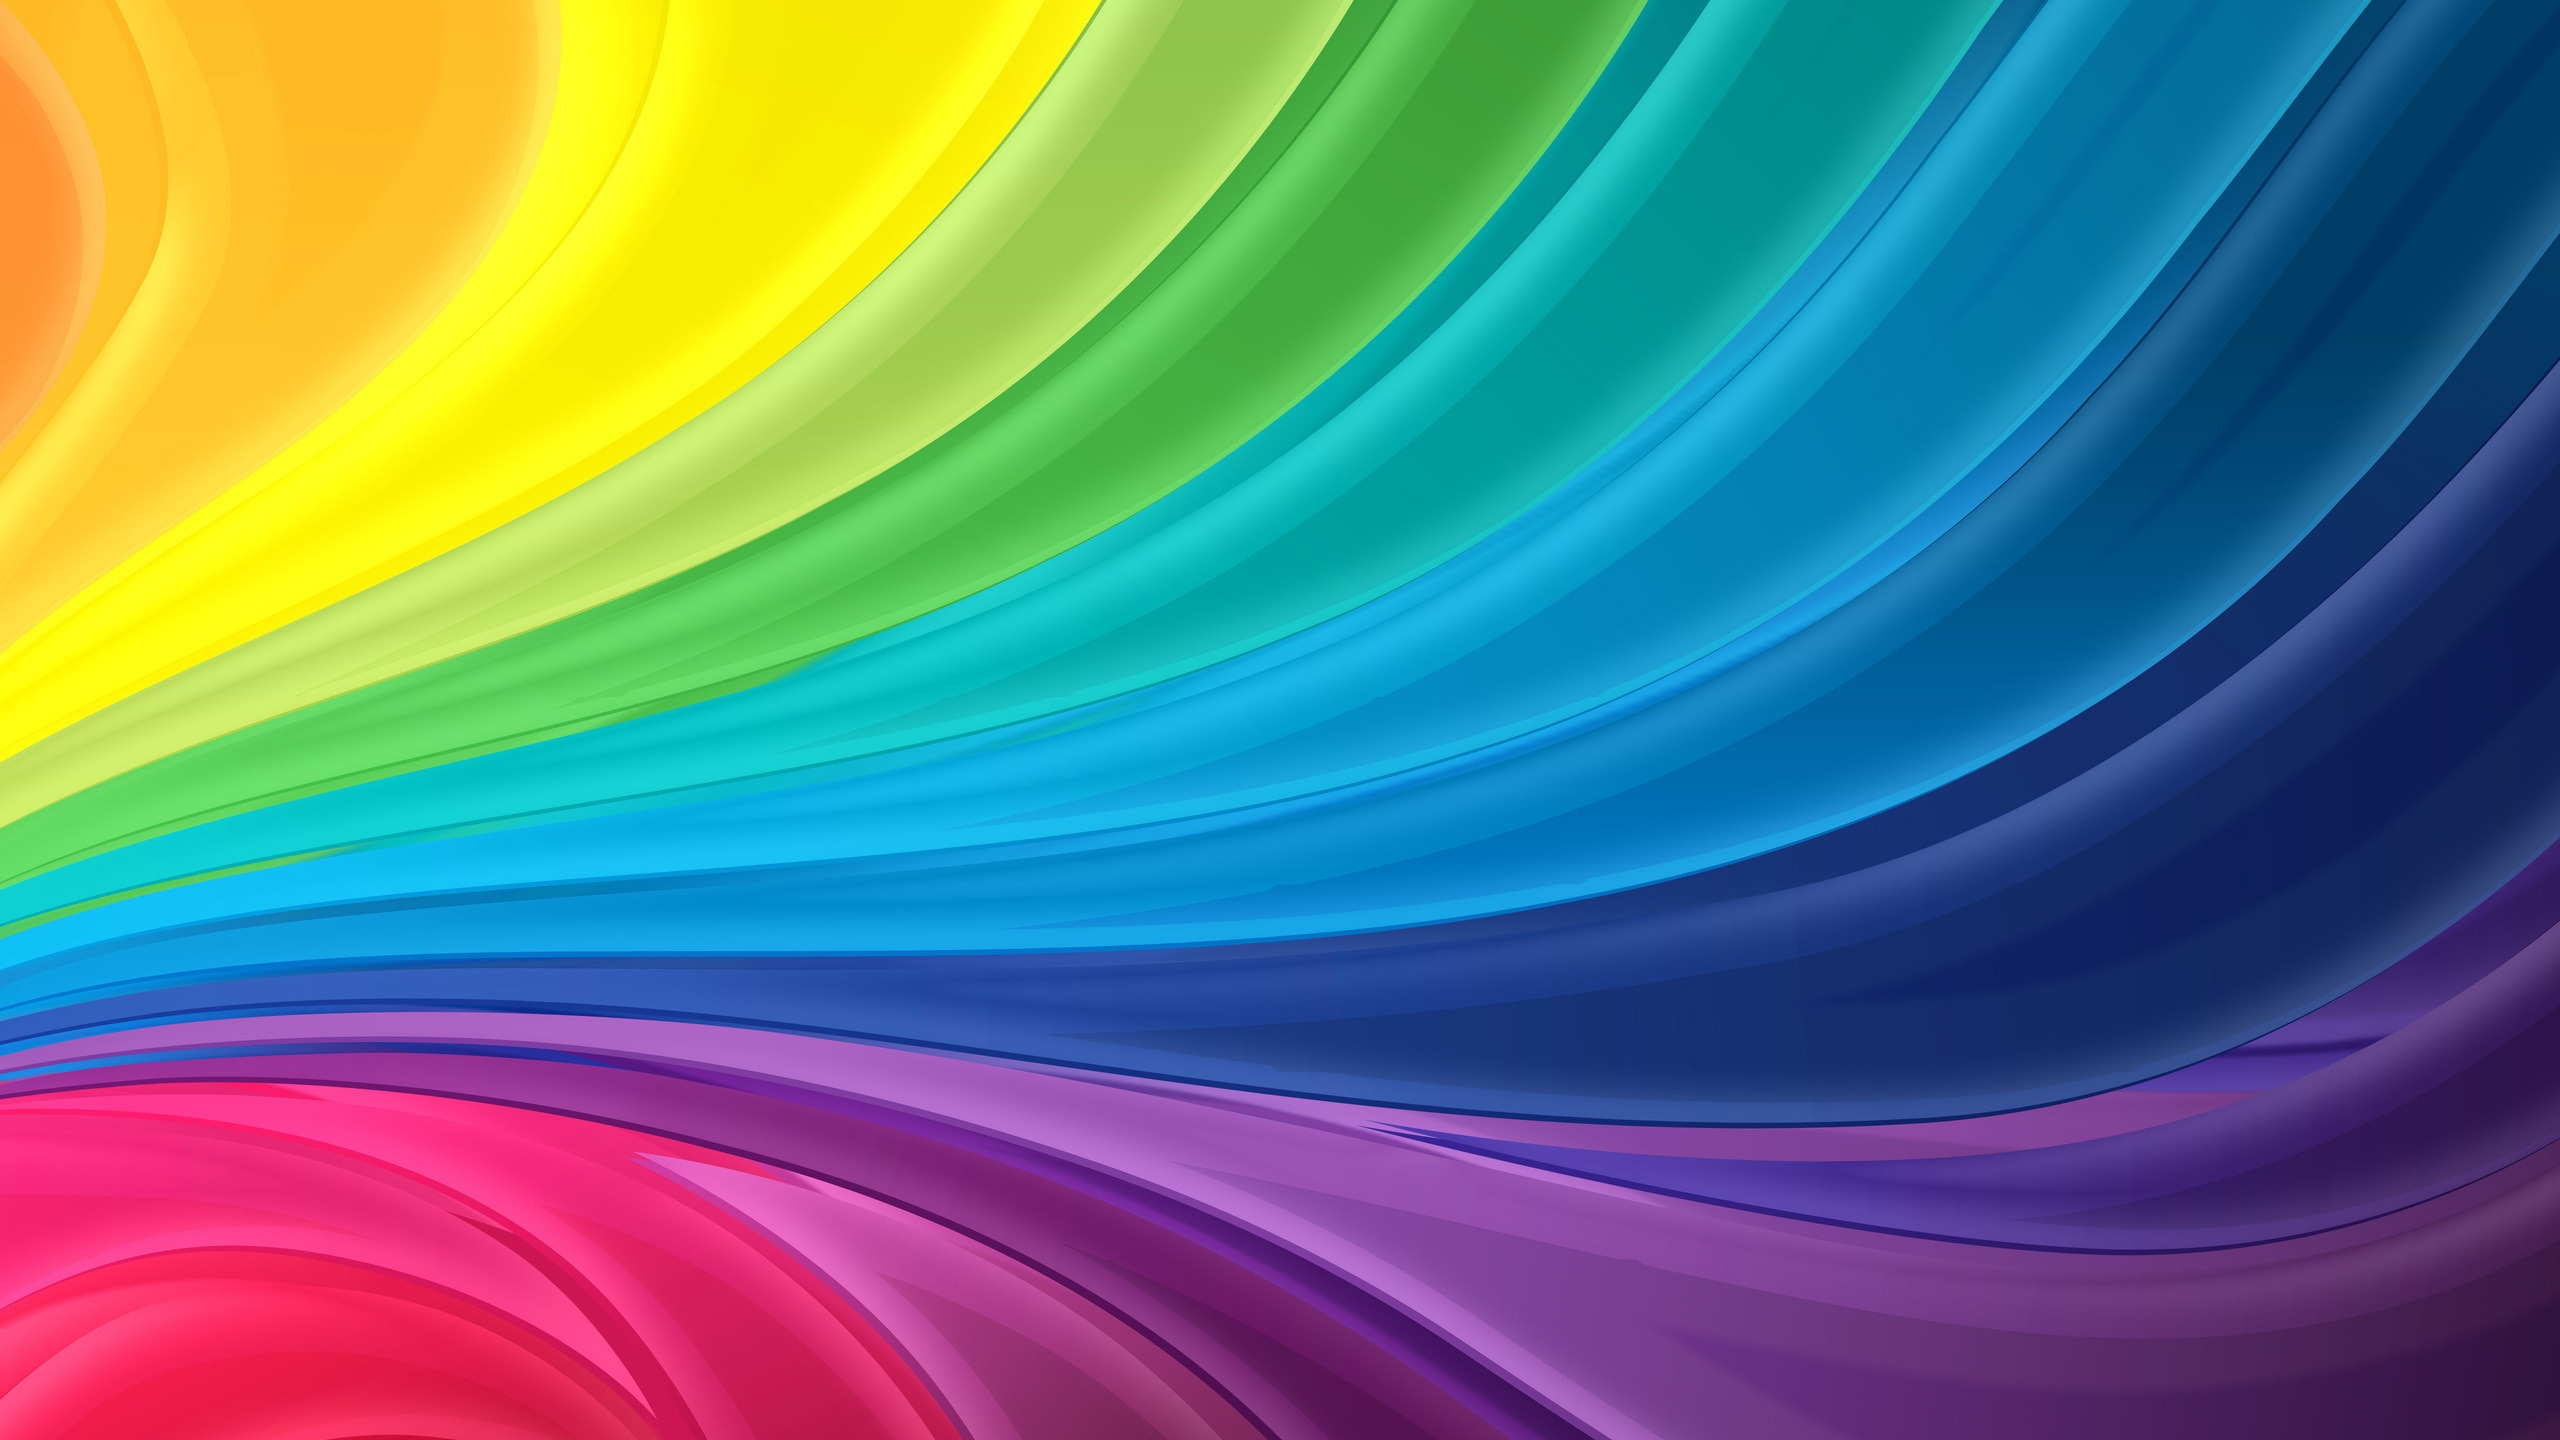 Curl Rainbow 2560x1440 Hdtv Wallpaper